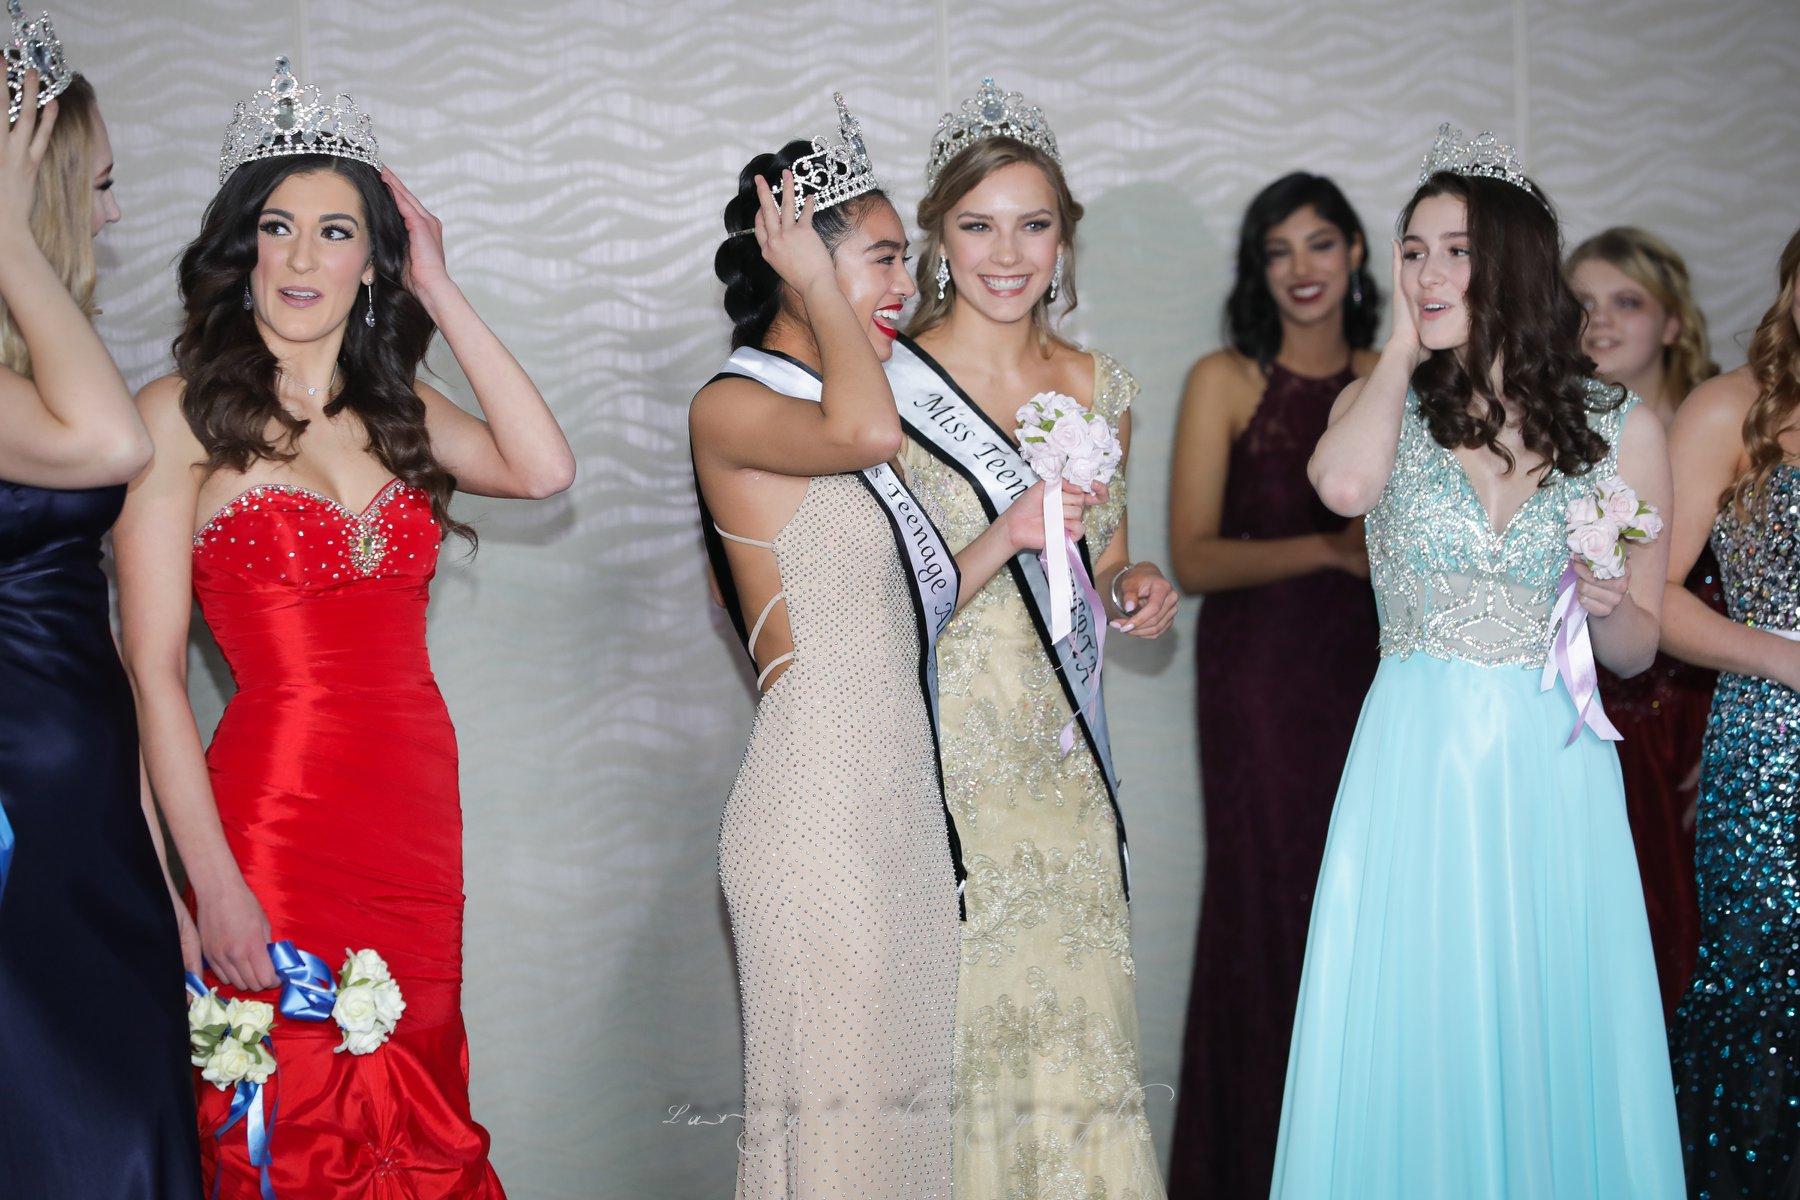 Miss Teenage Alberta 2018 - MALIYA C.